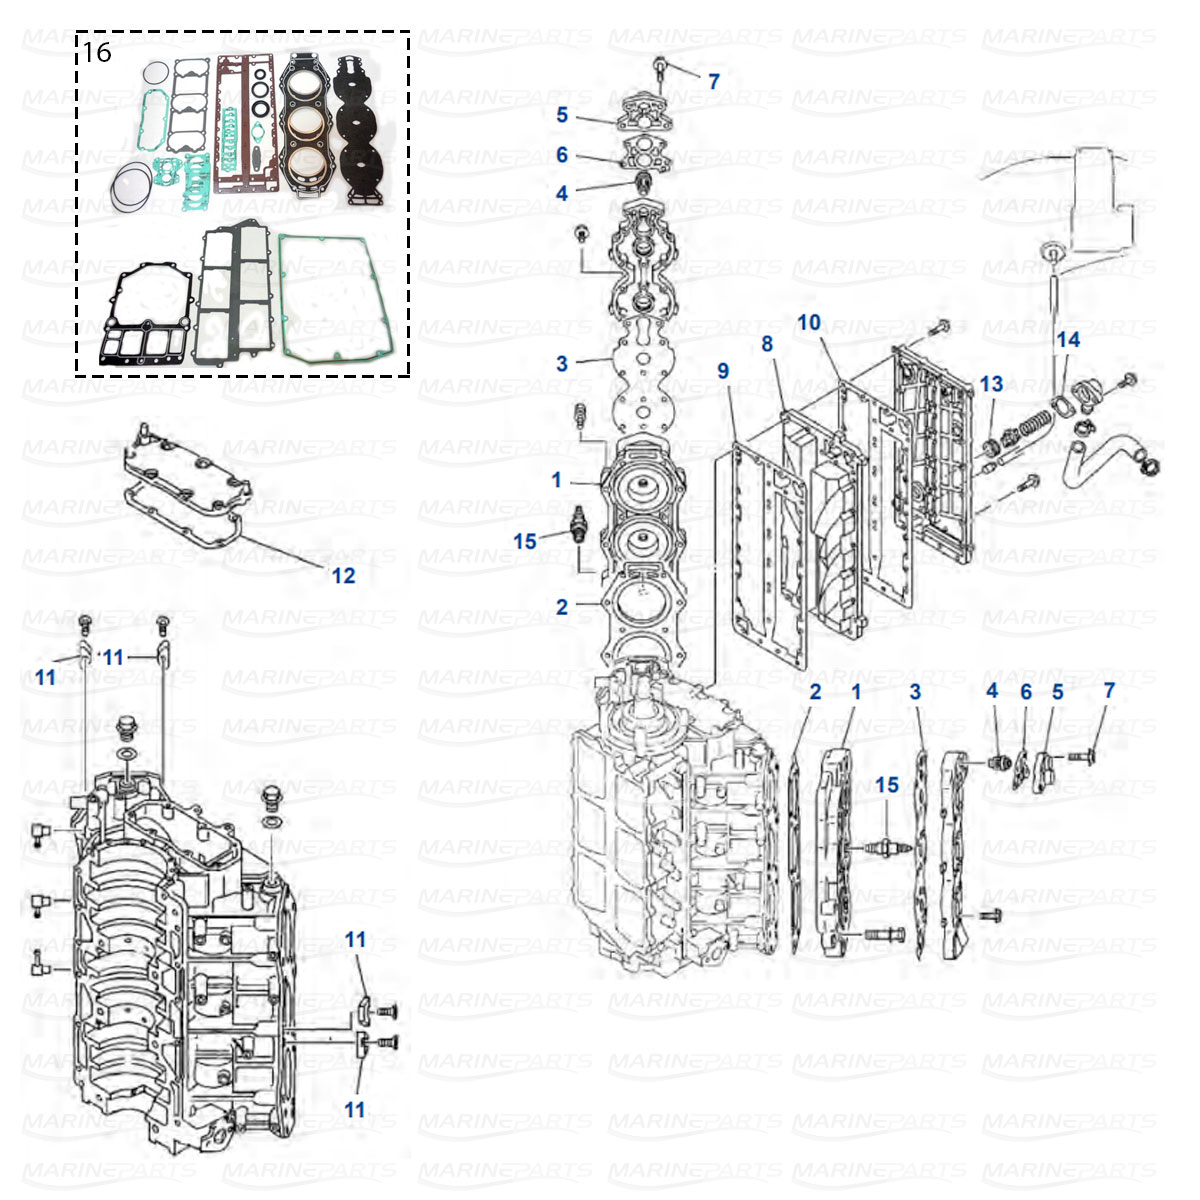 Yamaha Engine Parts For Outboard Motor Marineparts